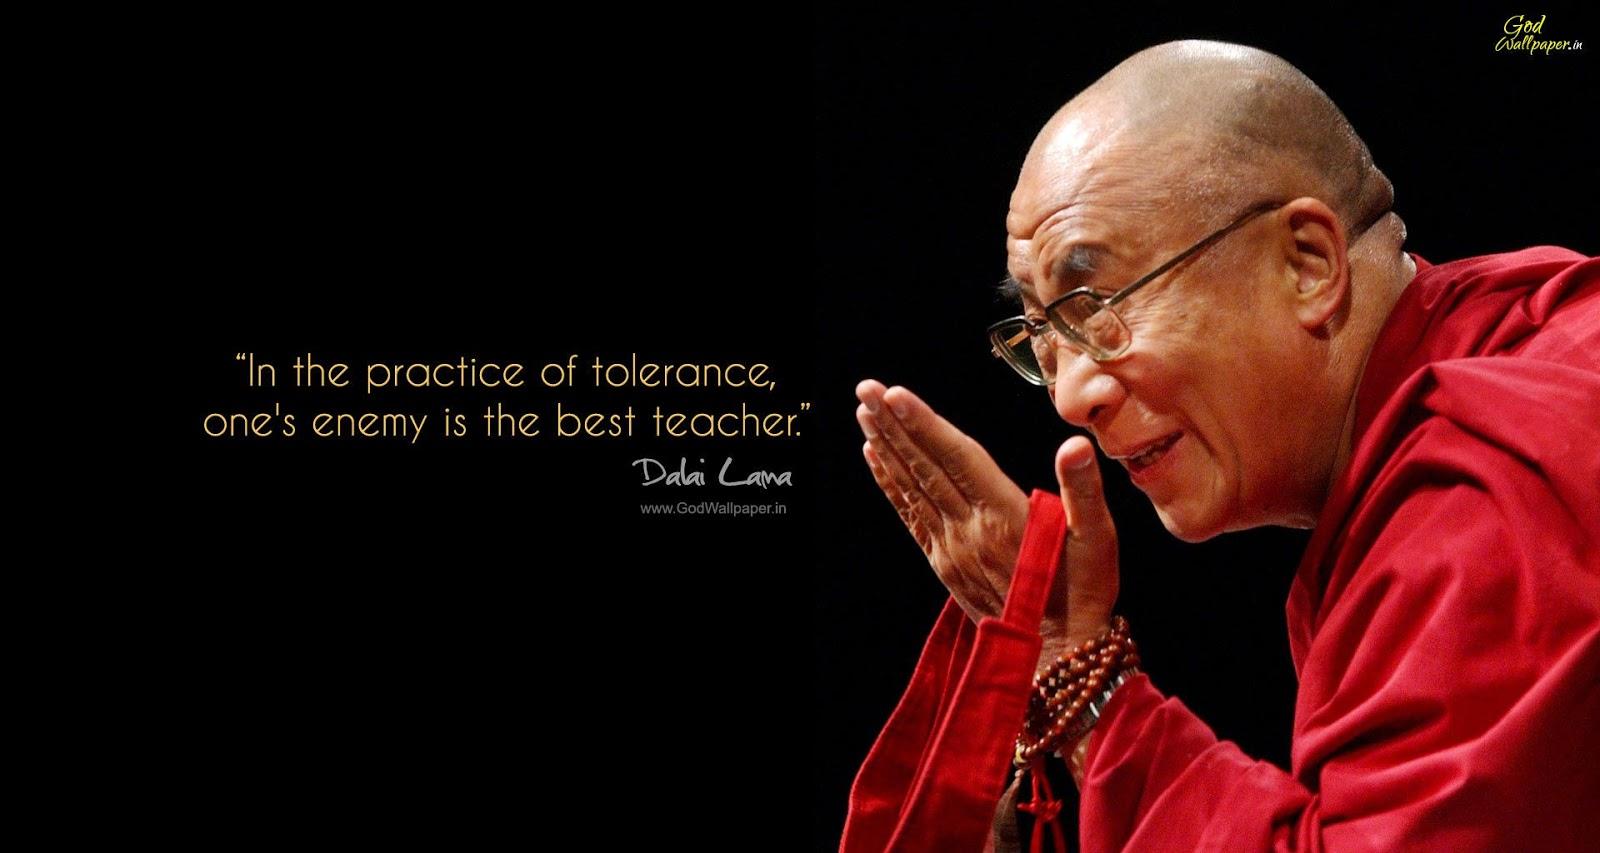 Dalai Lama Quotes wallpapers